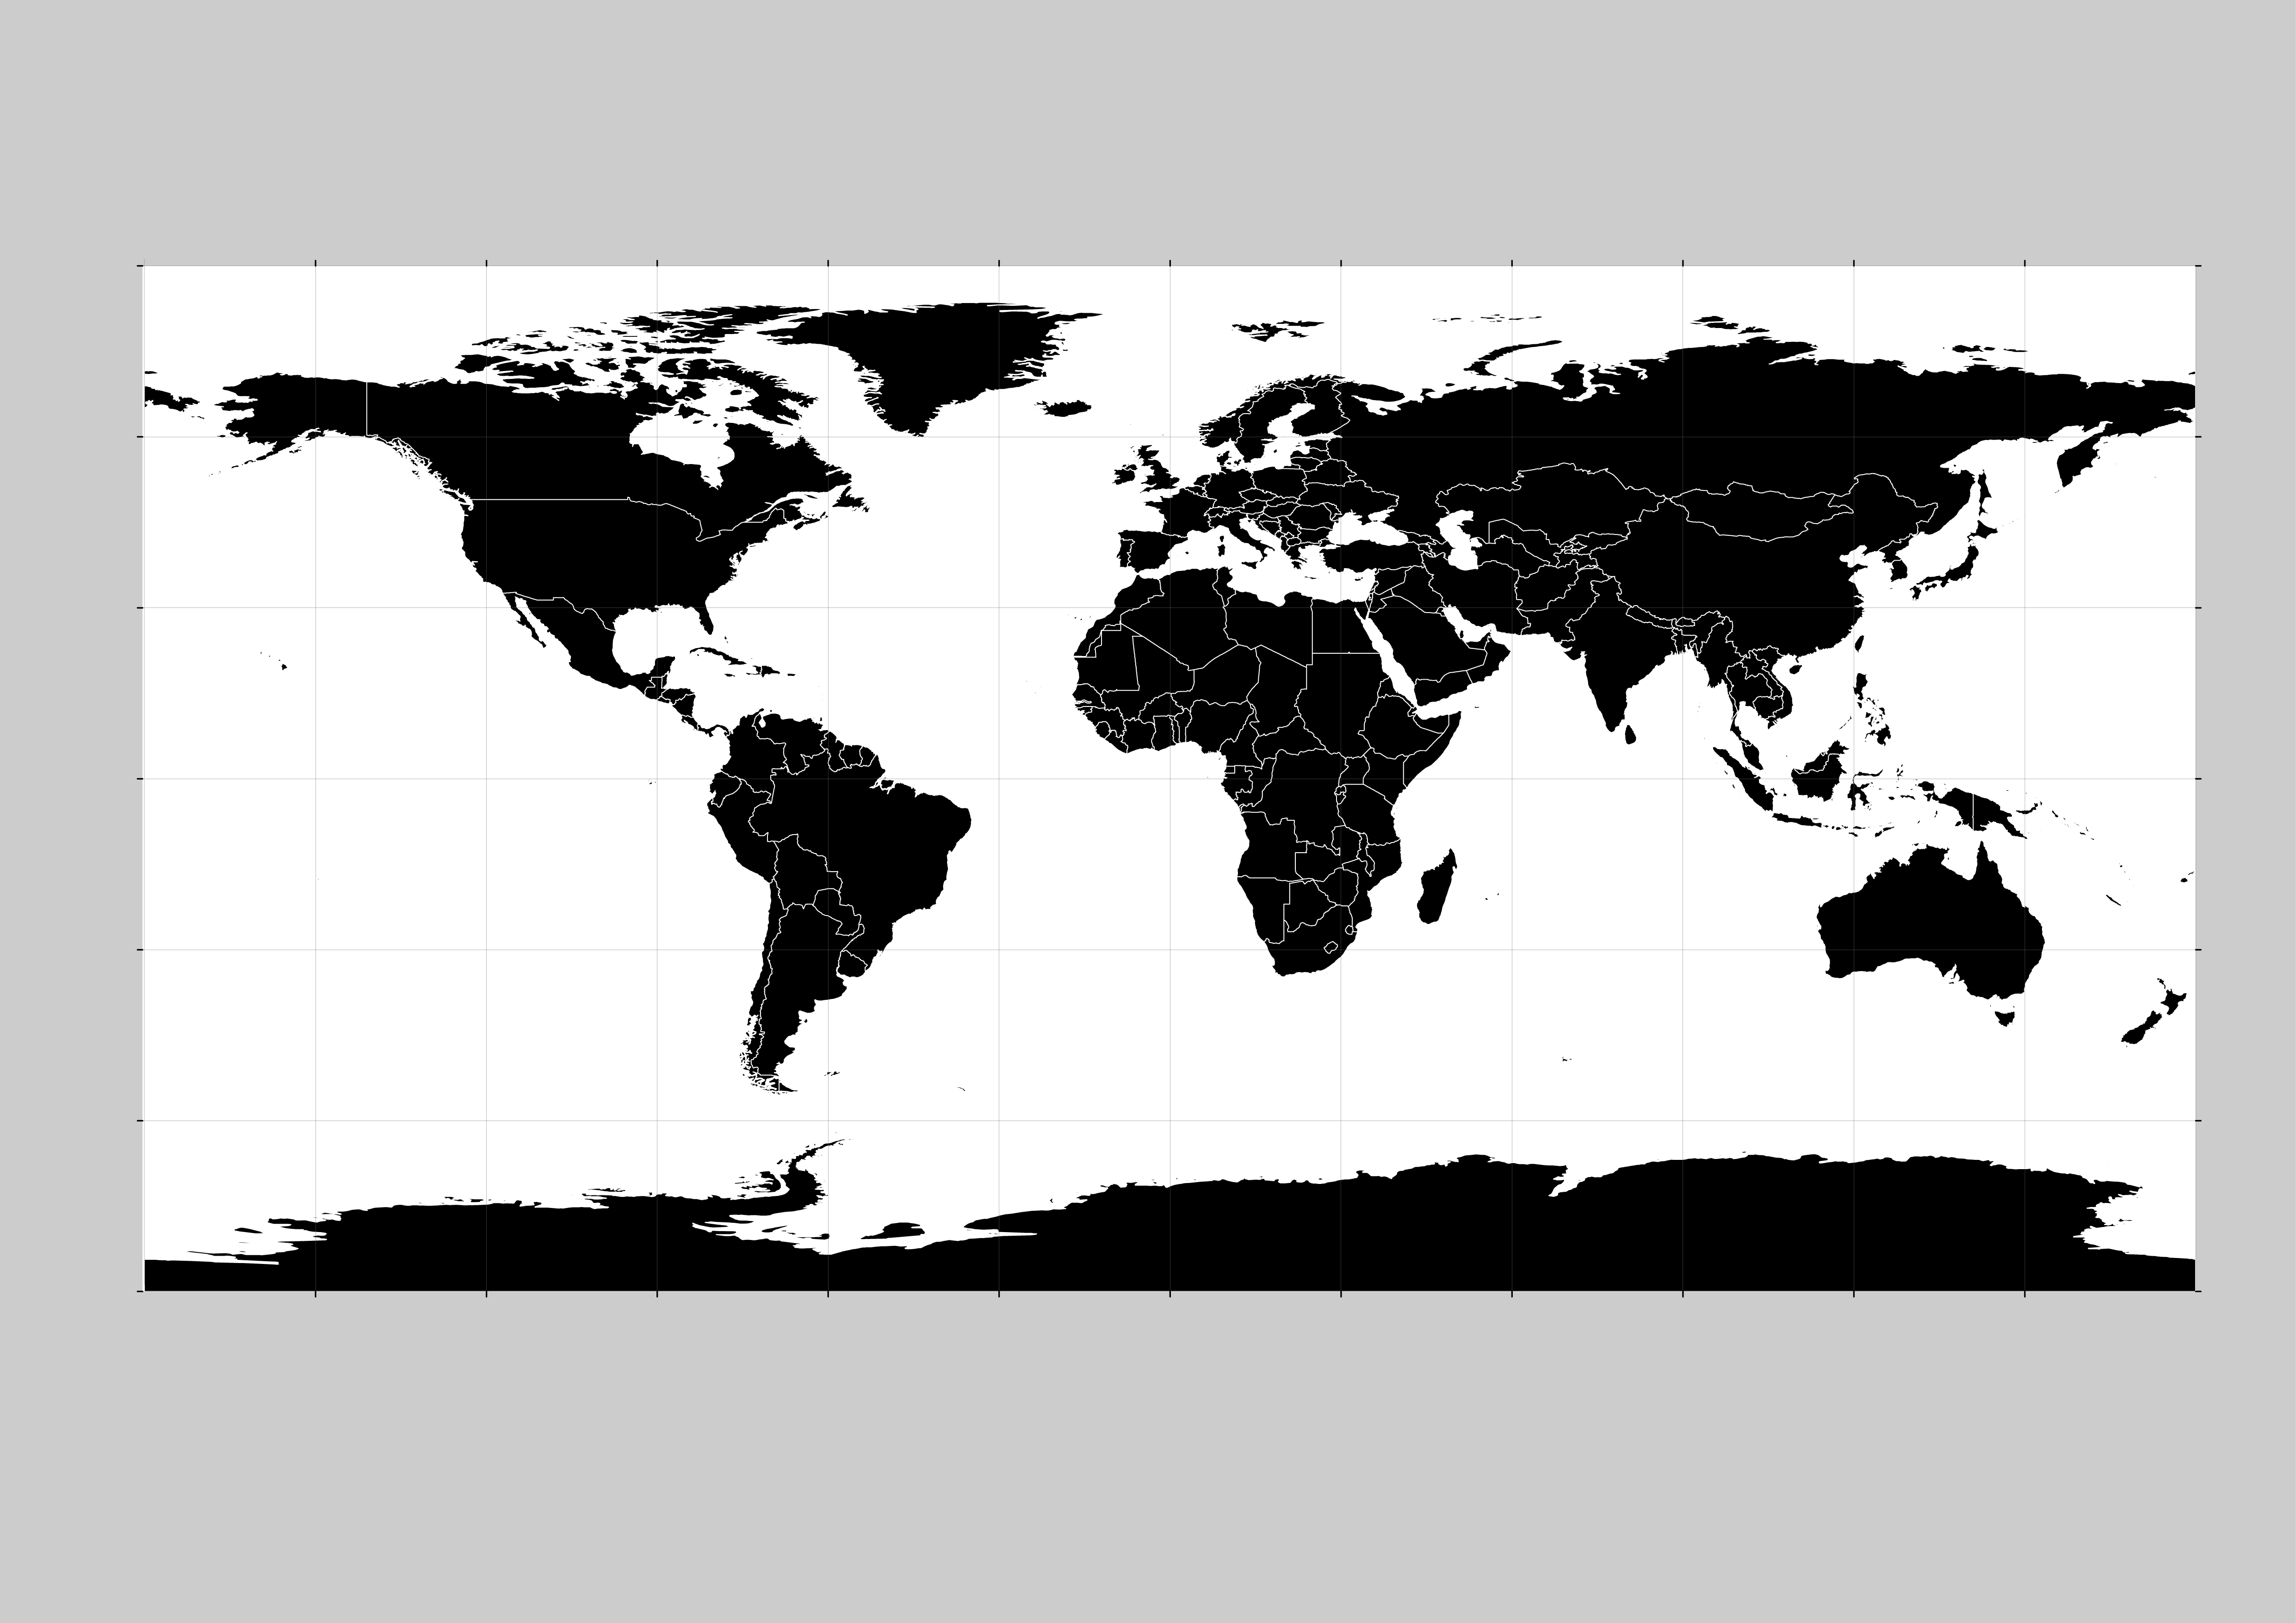 4963x3508 144 Free Vector World Maps